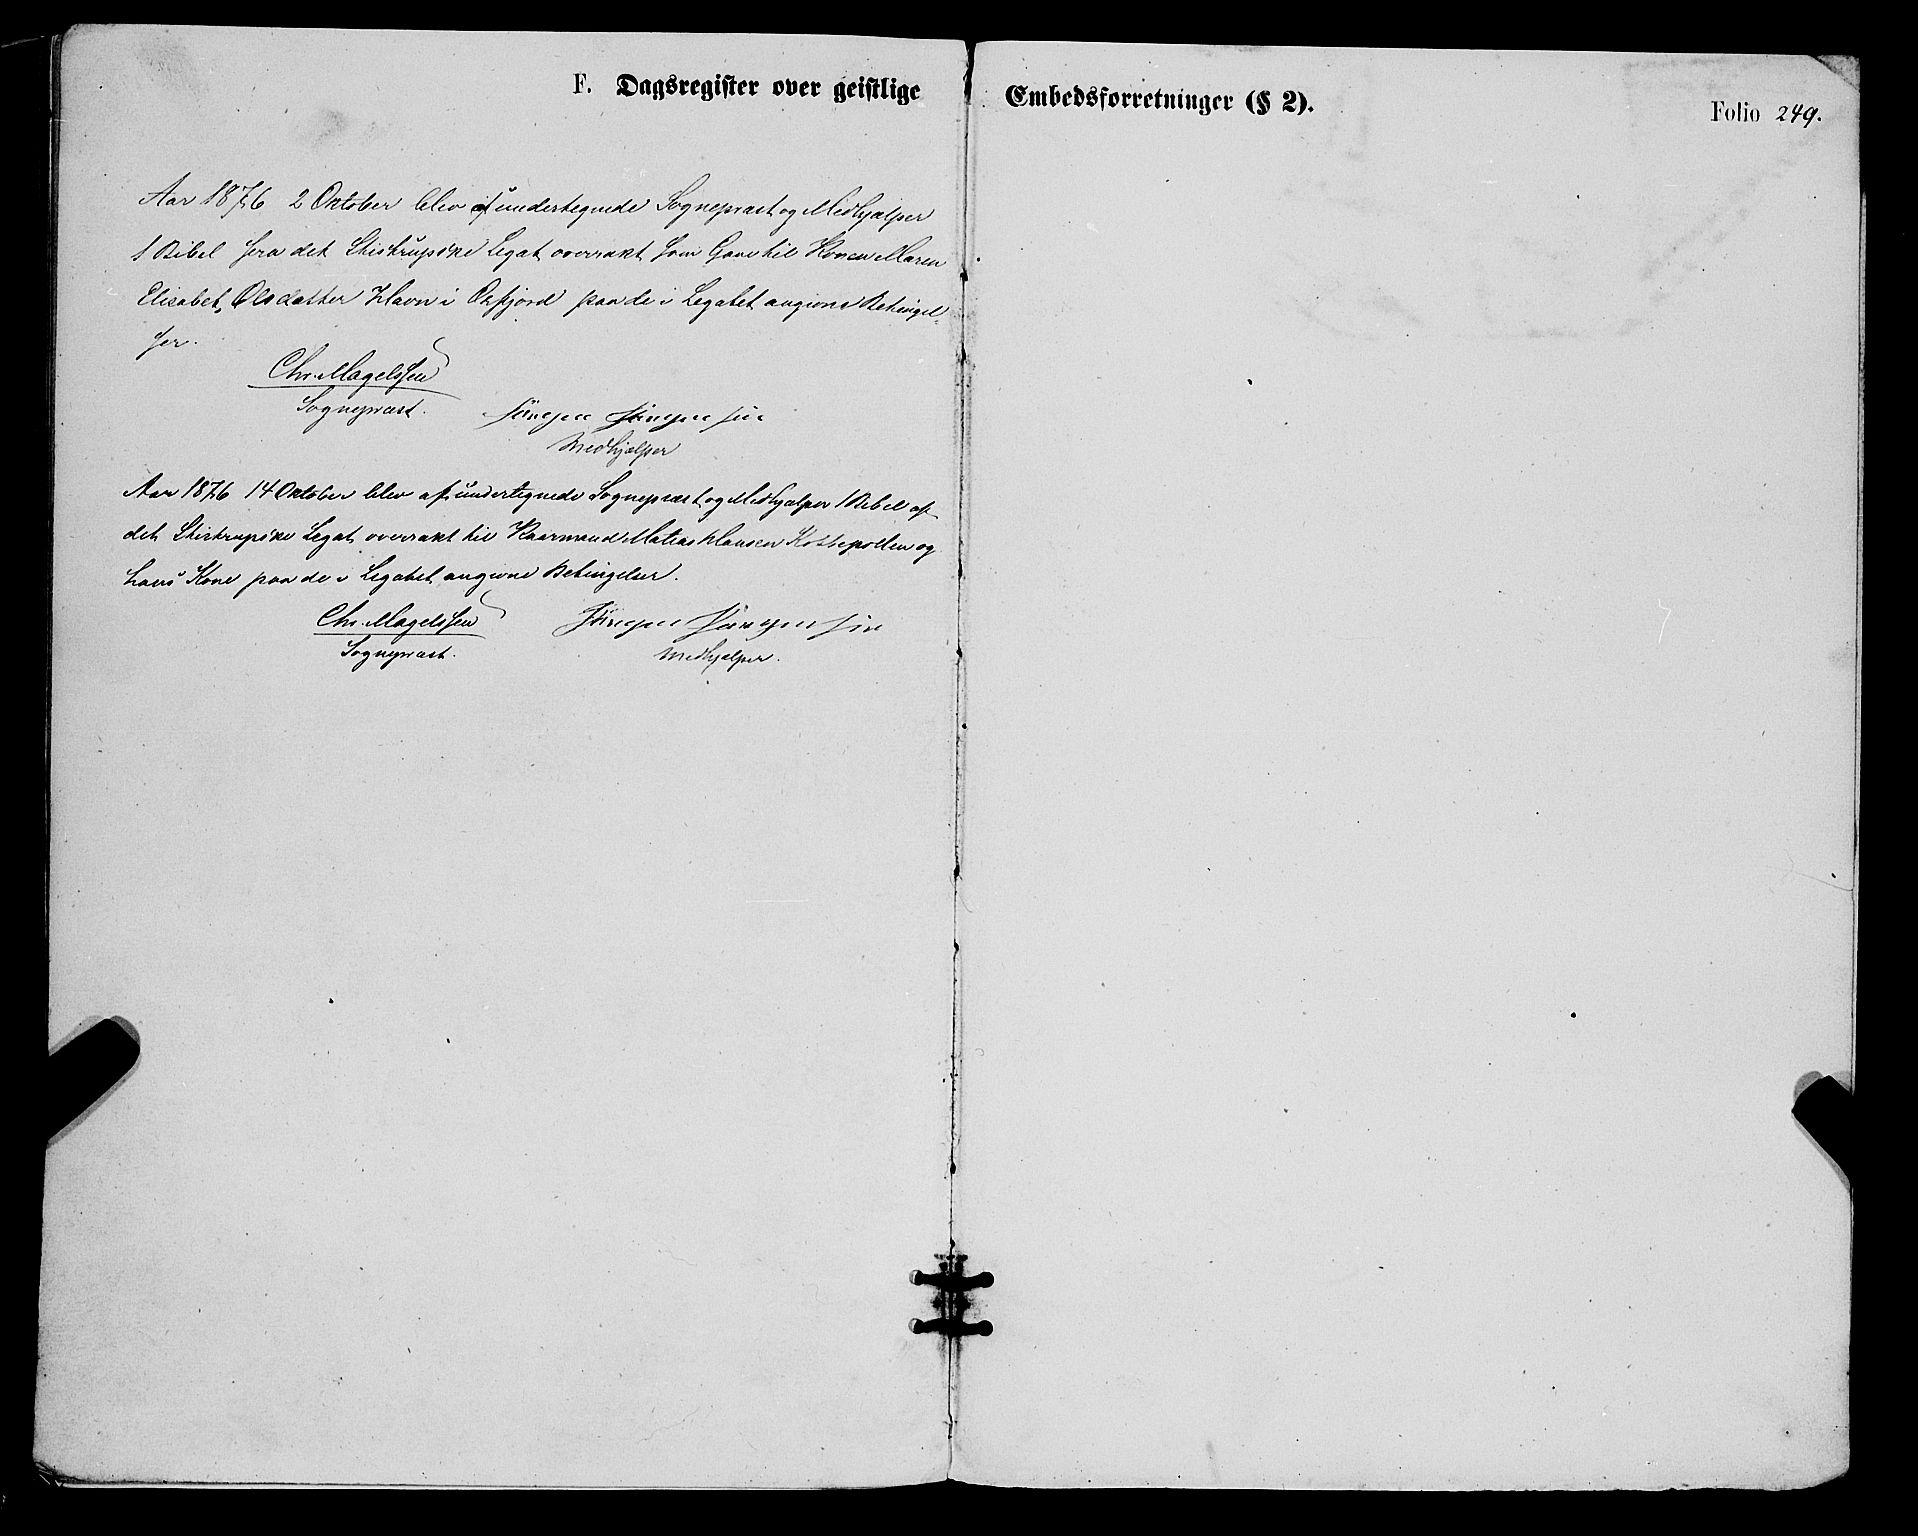 SATØ, Skjervøy sokneprestkontor, H/Ha/Haa/L0008kirke: Ministerialbok nr. 8, 1871-1877, s. 249